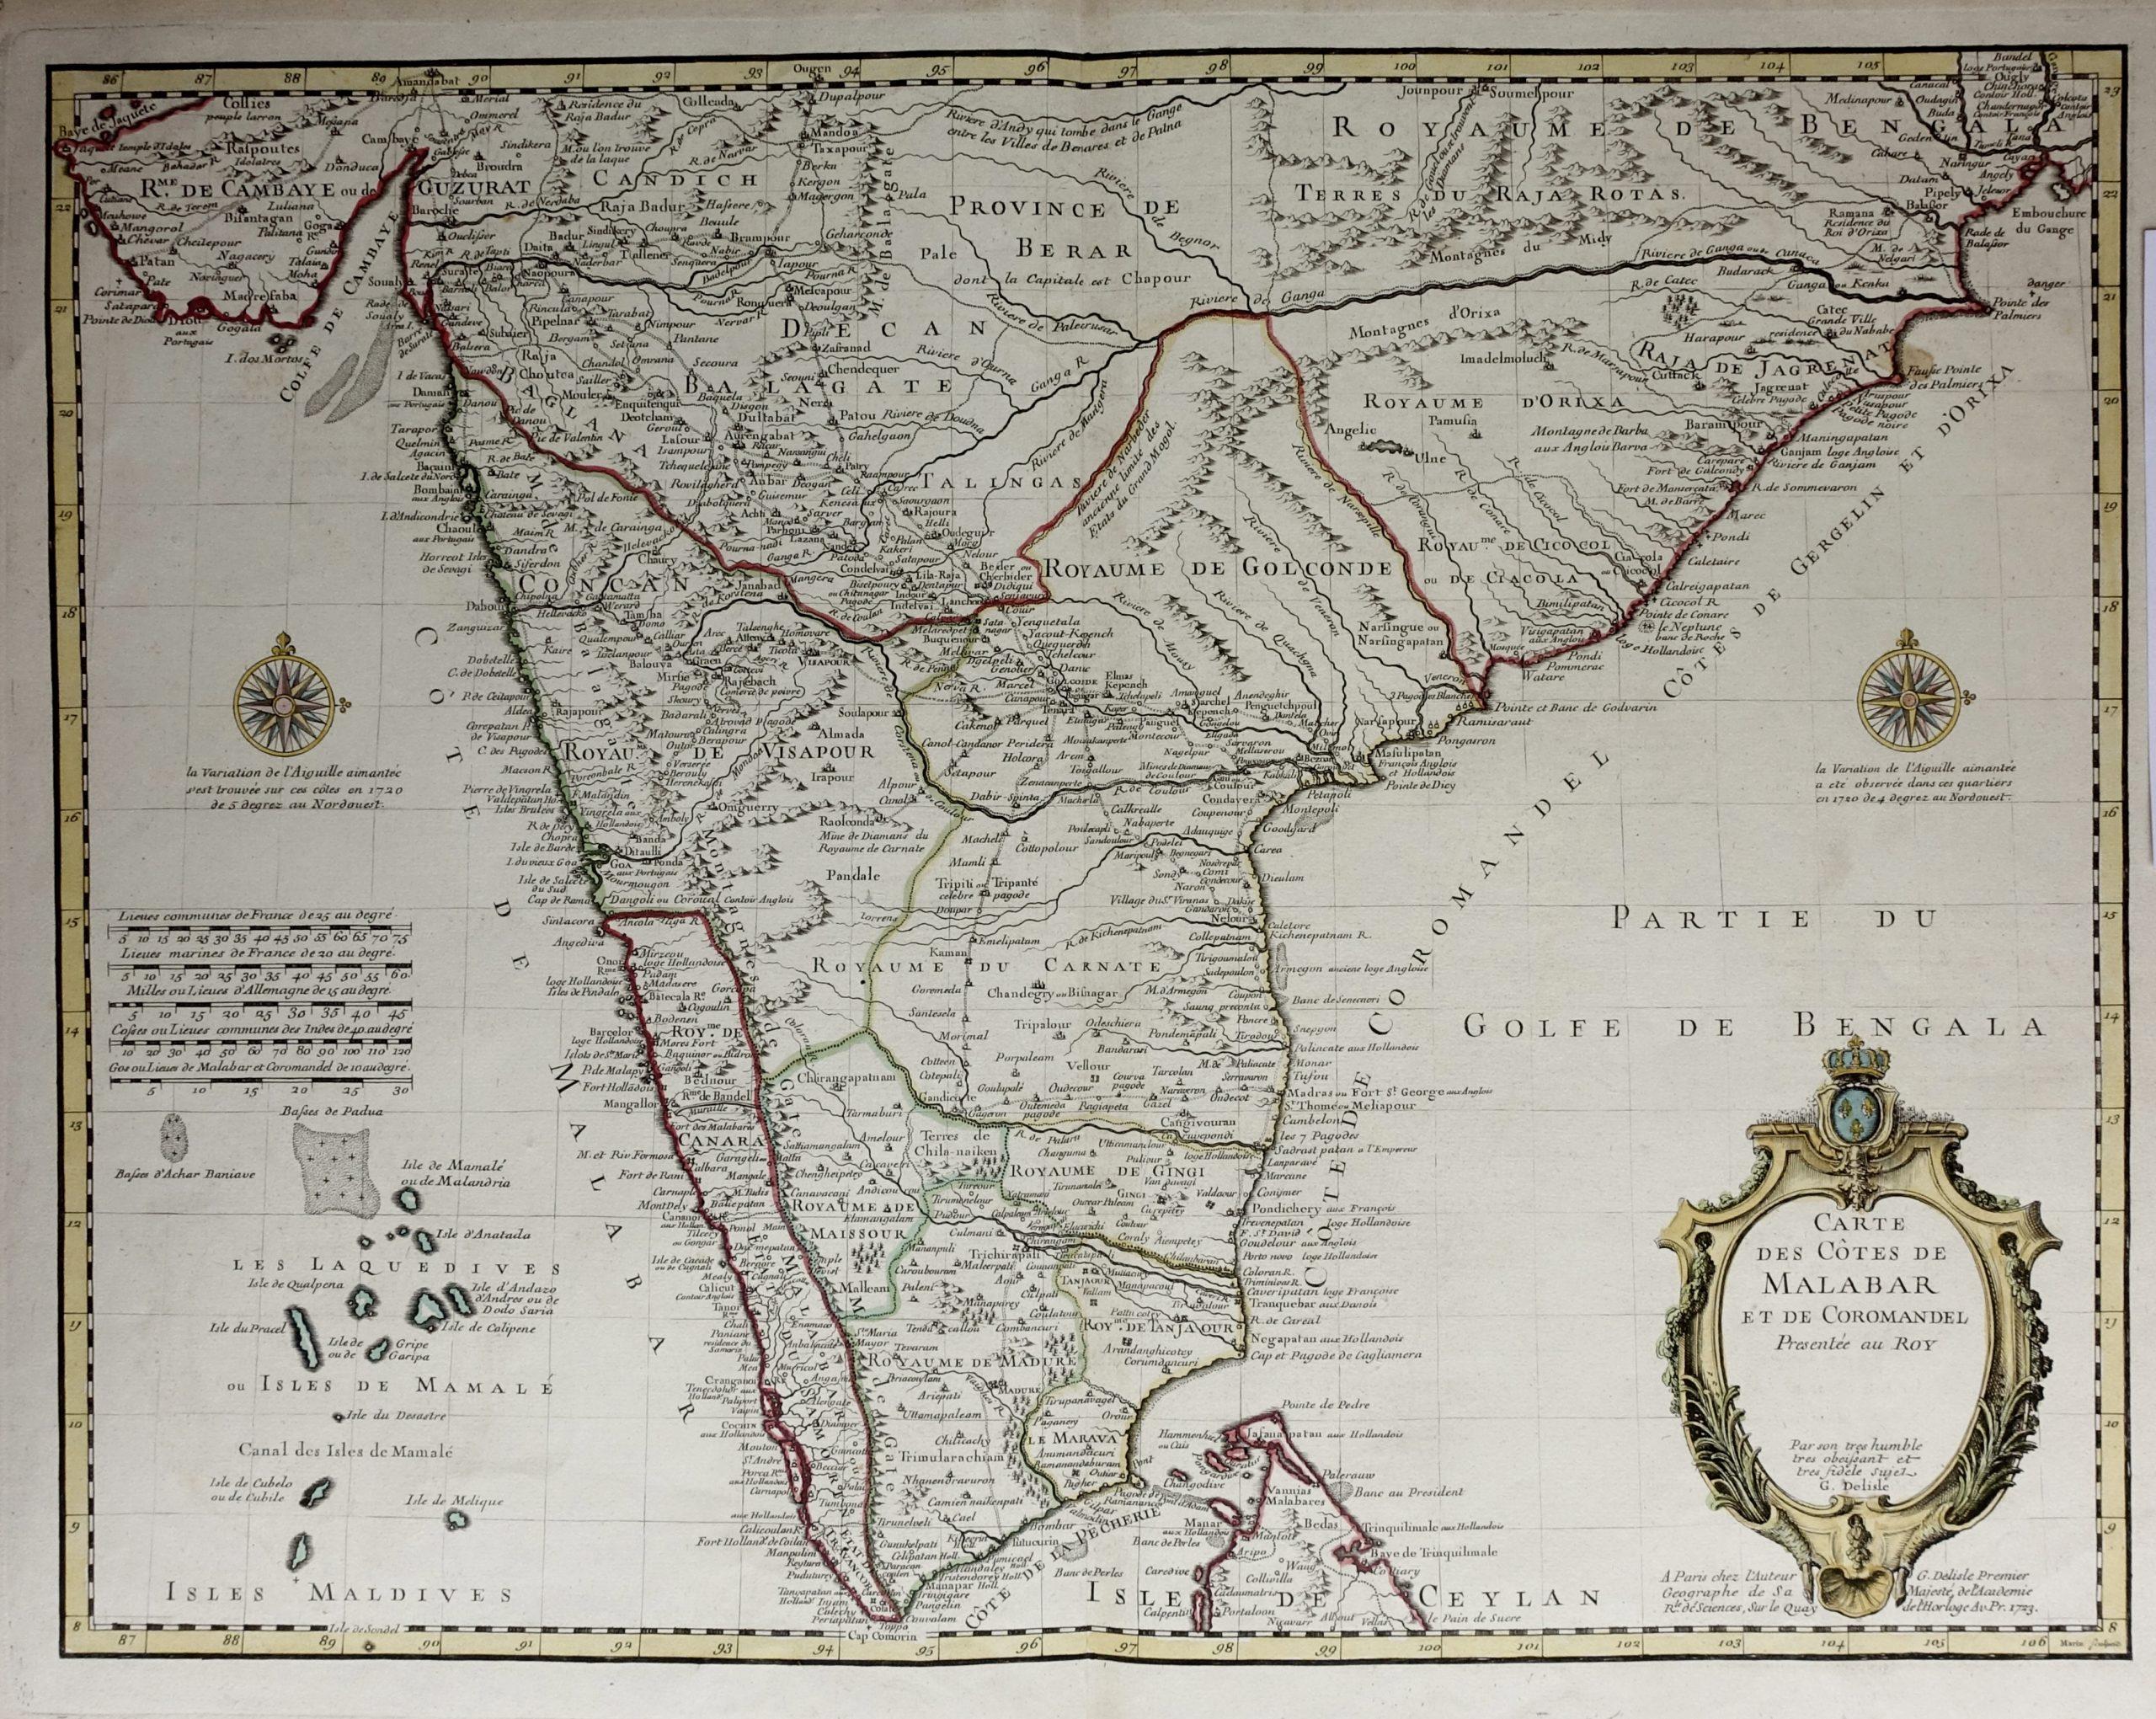 Antique Map of India and Sri Lanka - Delisle (1722)